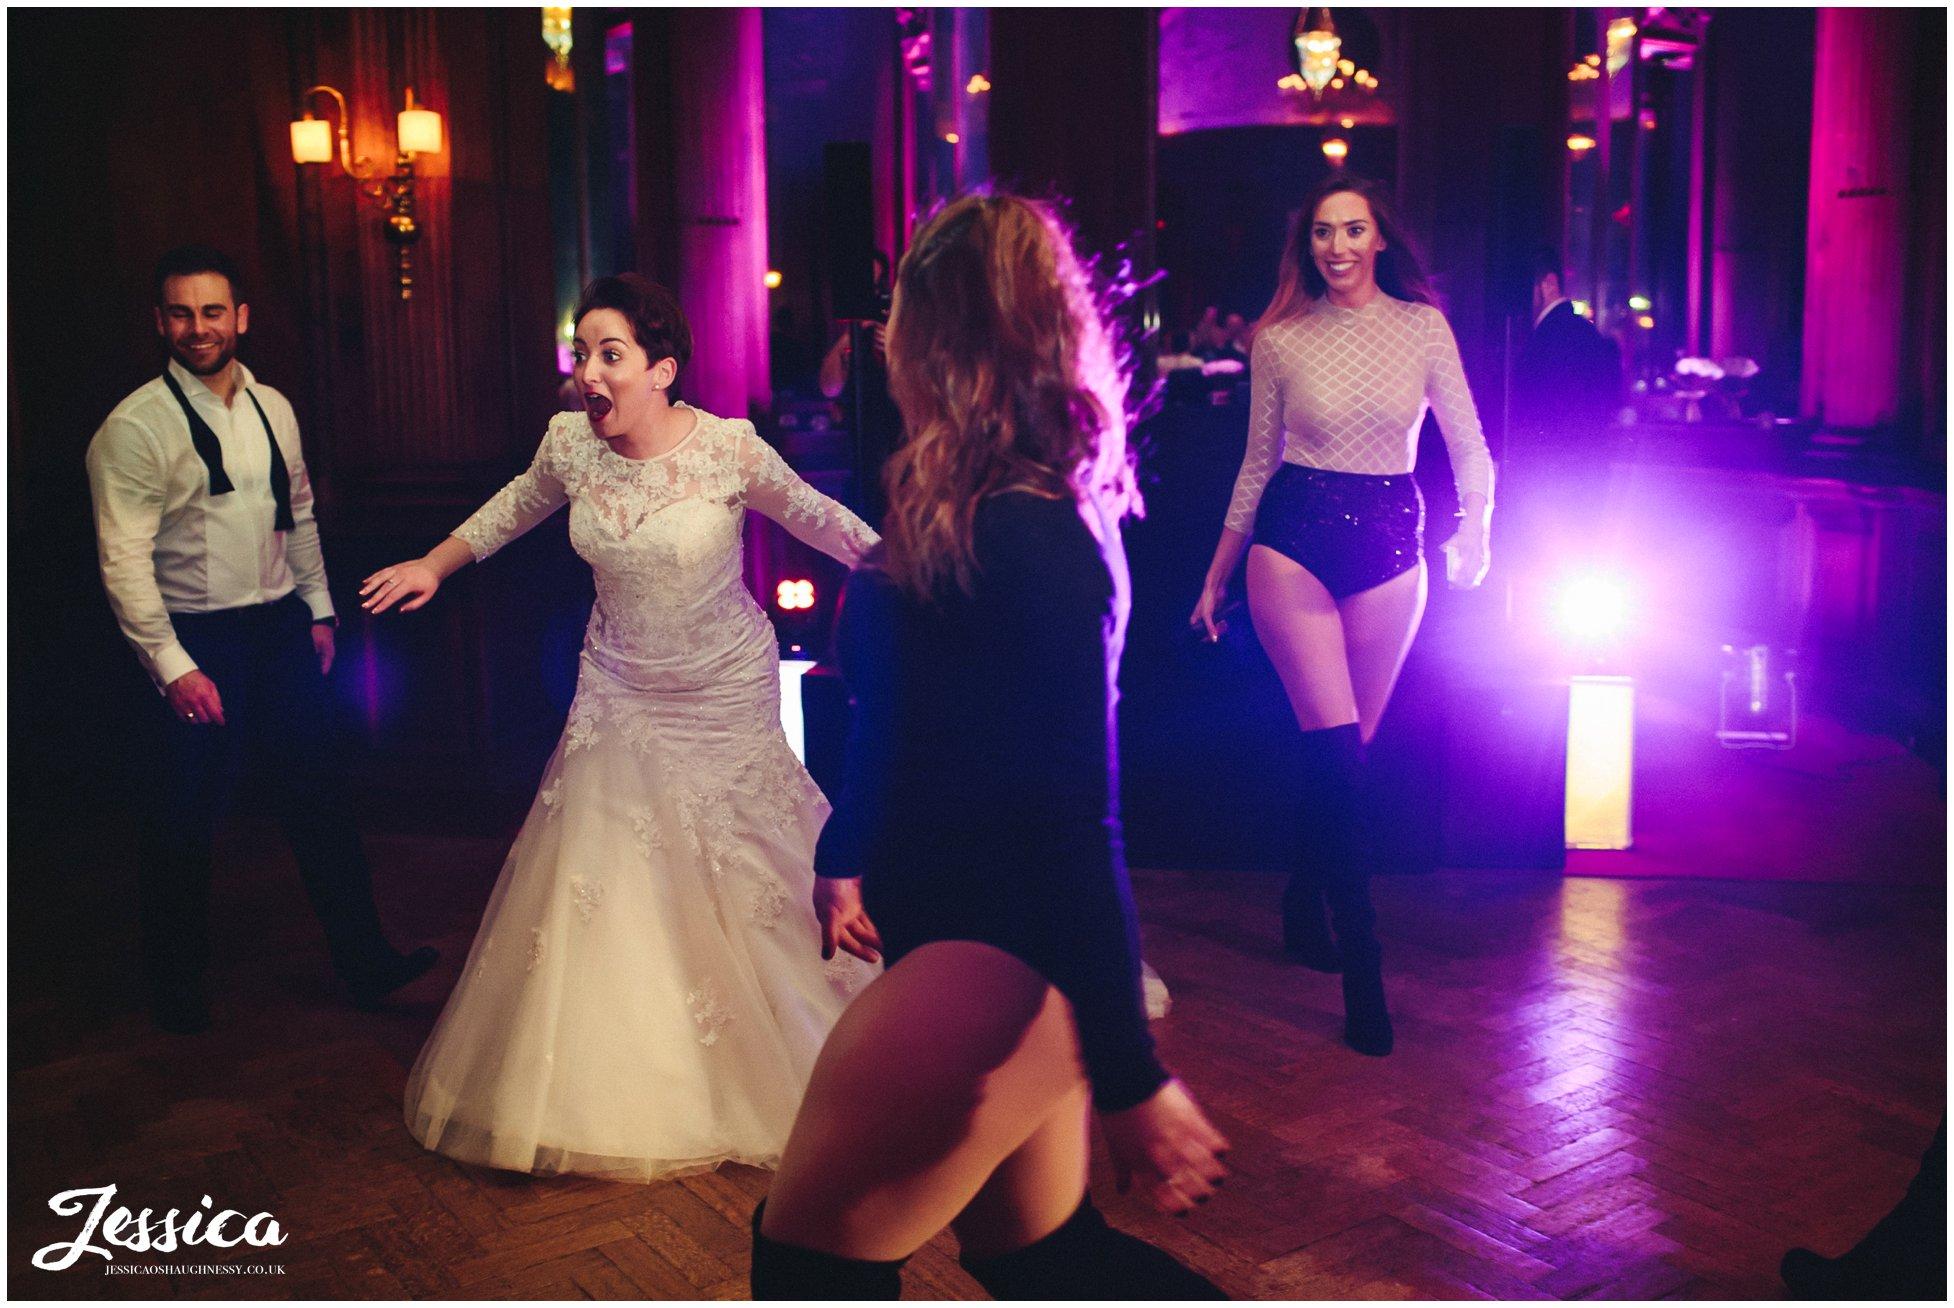 bride looks shocked as her bridesmaid suprises her